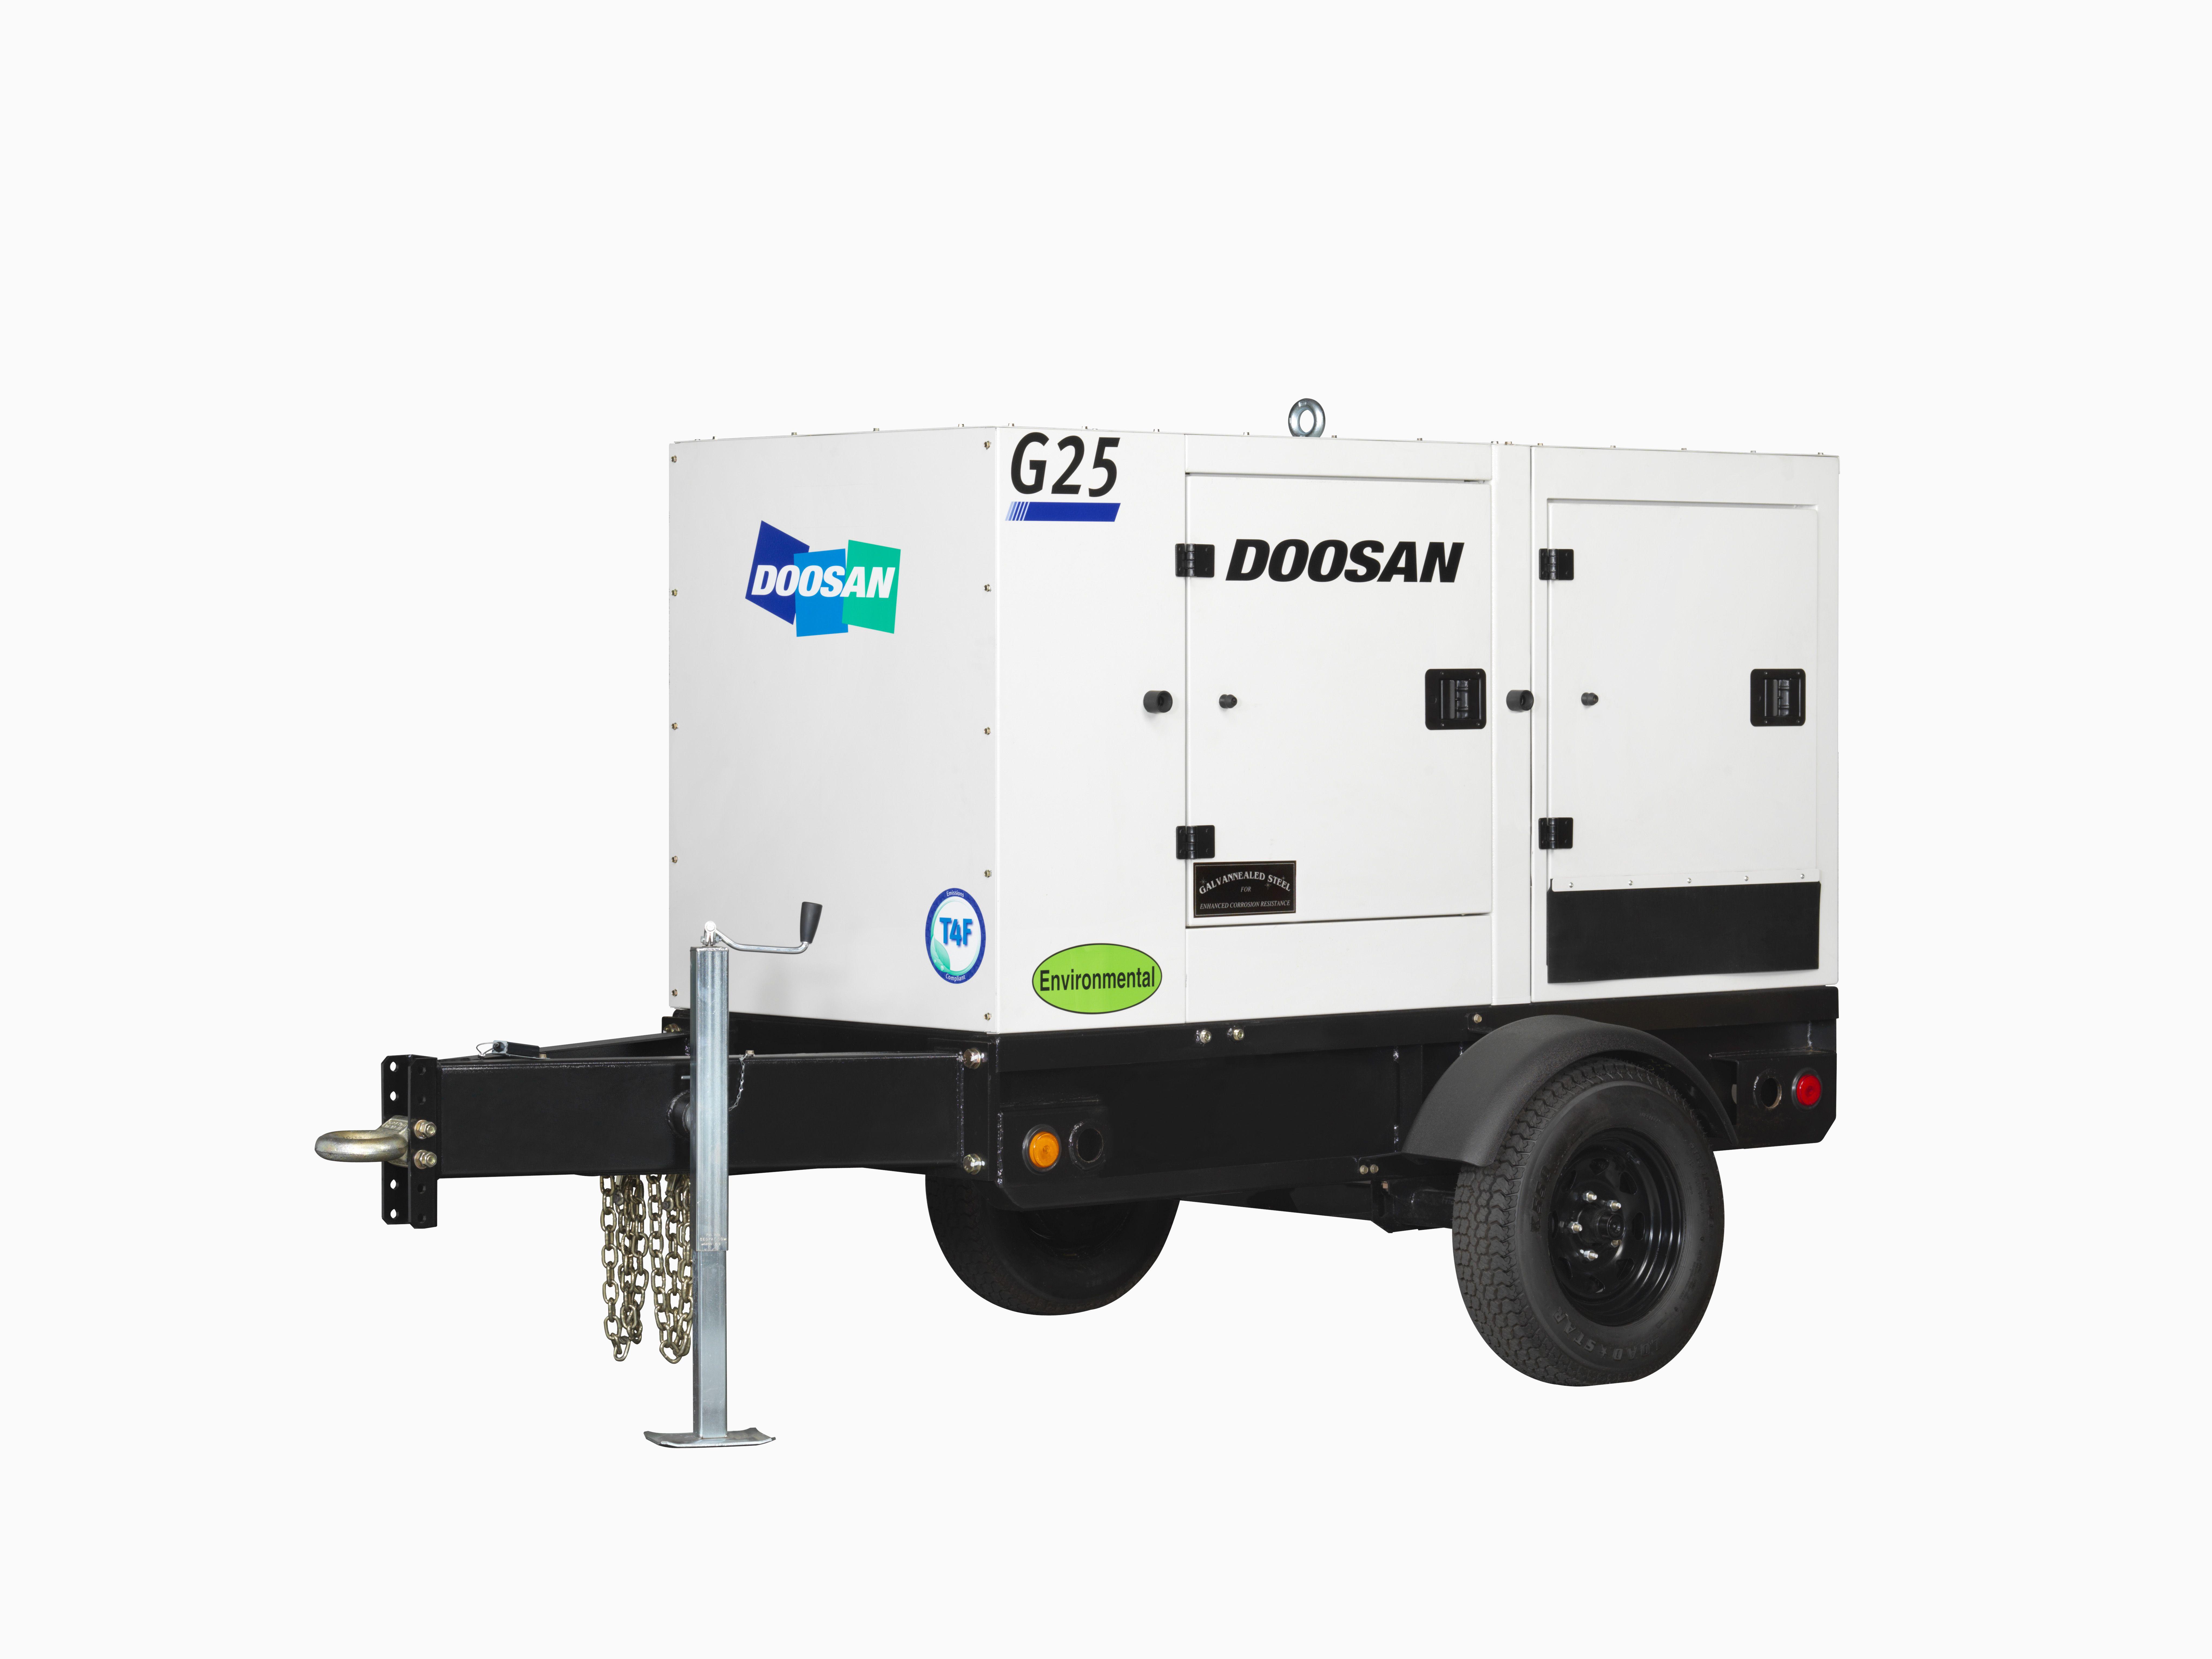 Doosan mobile generators offer extended run time construction